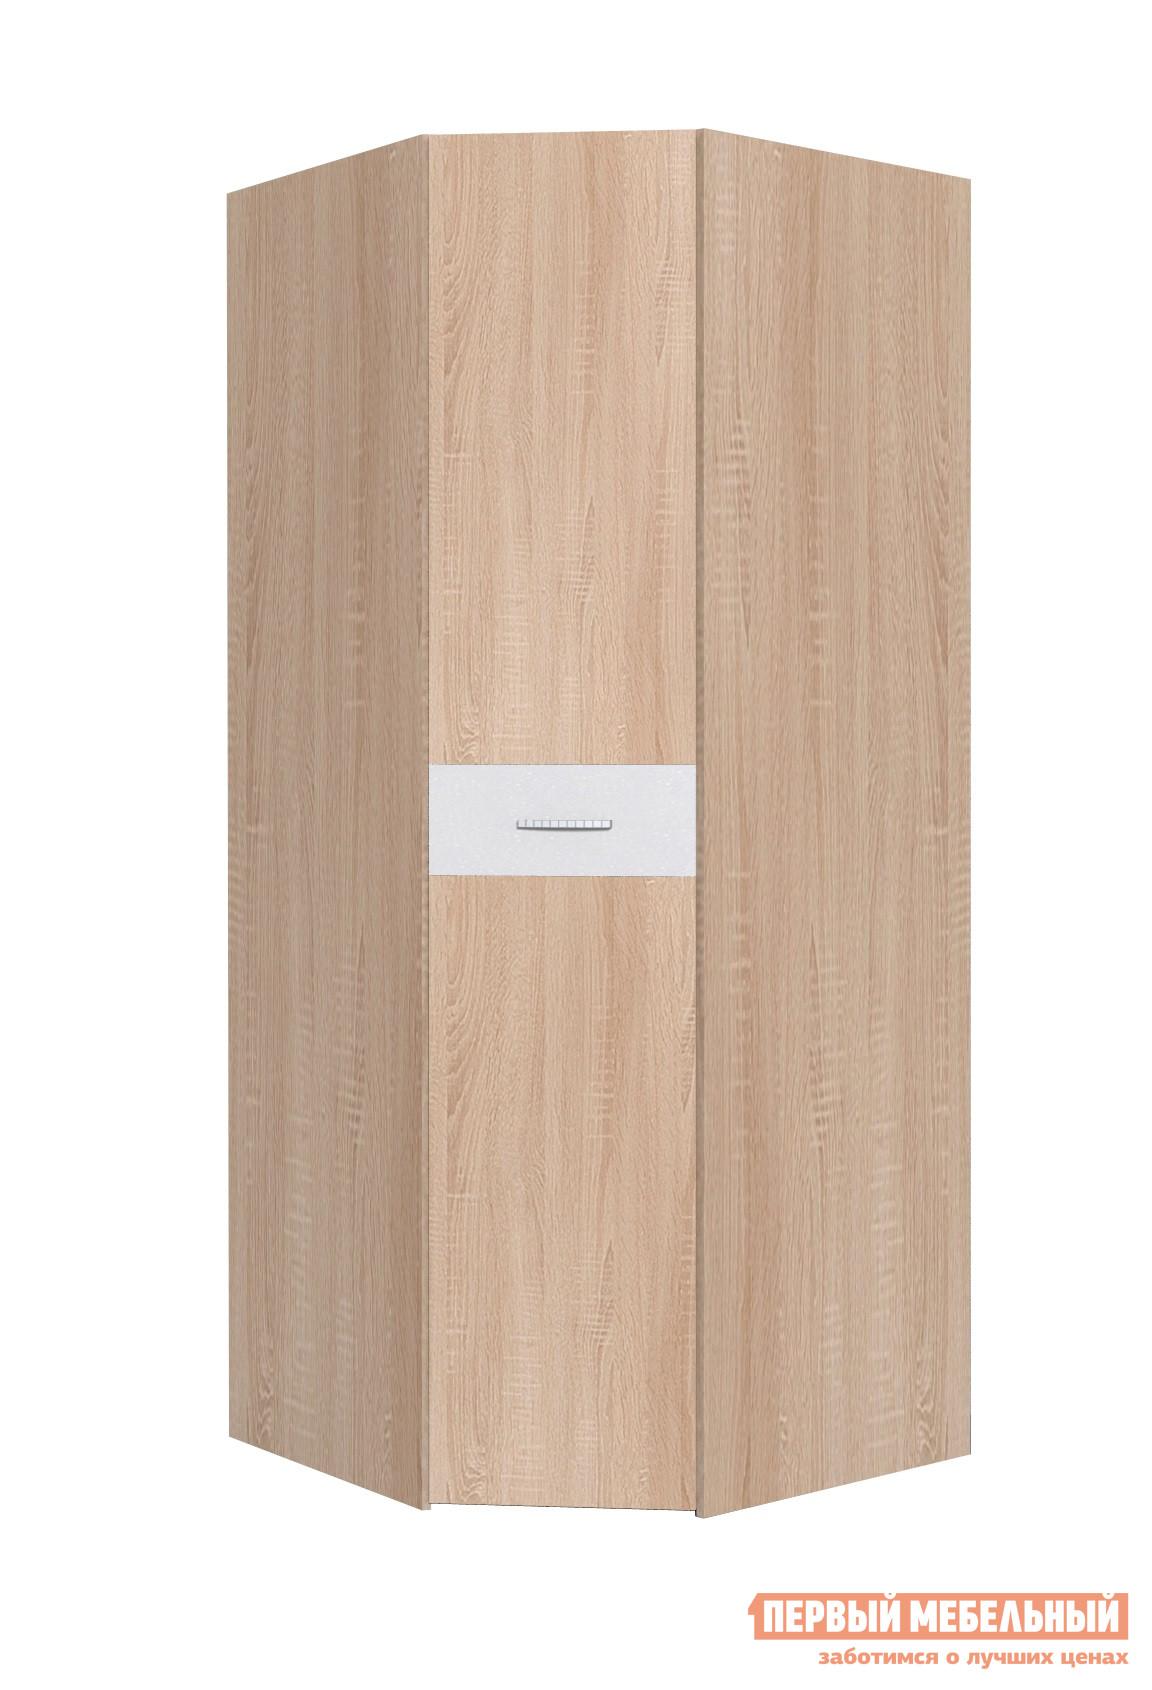 Шкаф распашной ТД Арника WYSPAA 37 (спальня) Шкаф угловой